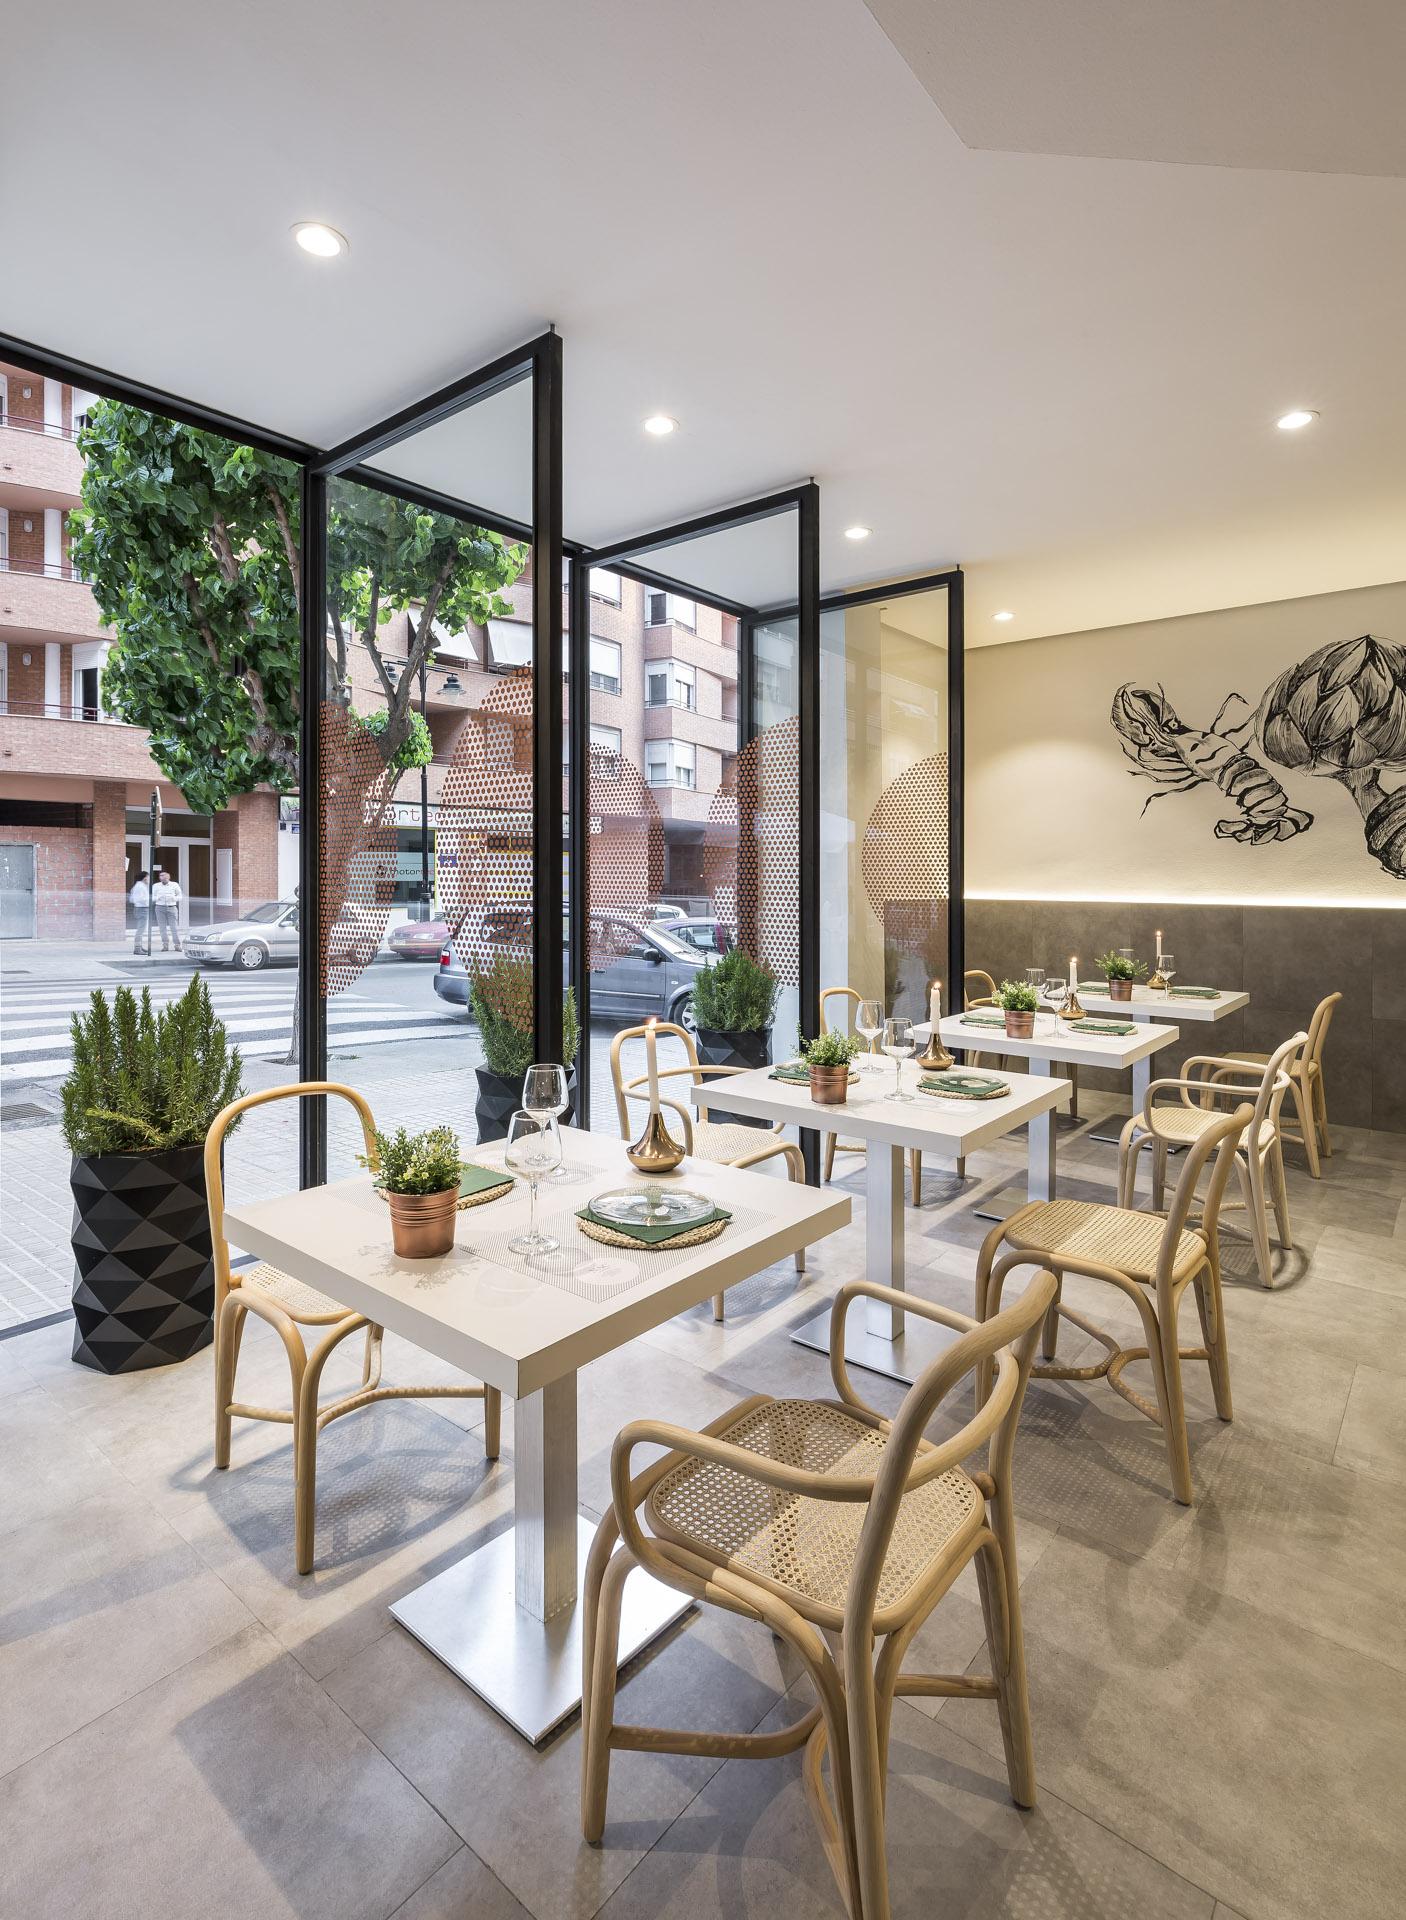 fotografia-arquitectura-valencia-german-cabo-estudihac-restaurante-nac-ontinyent-07